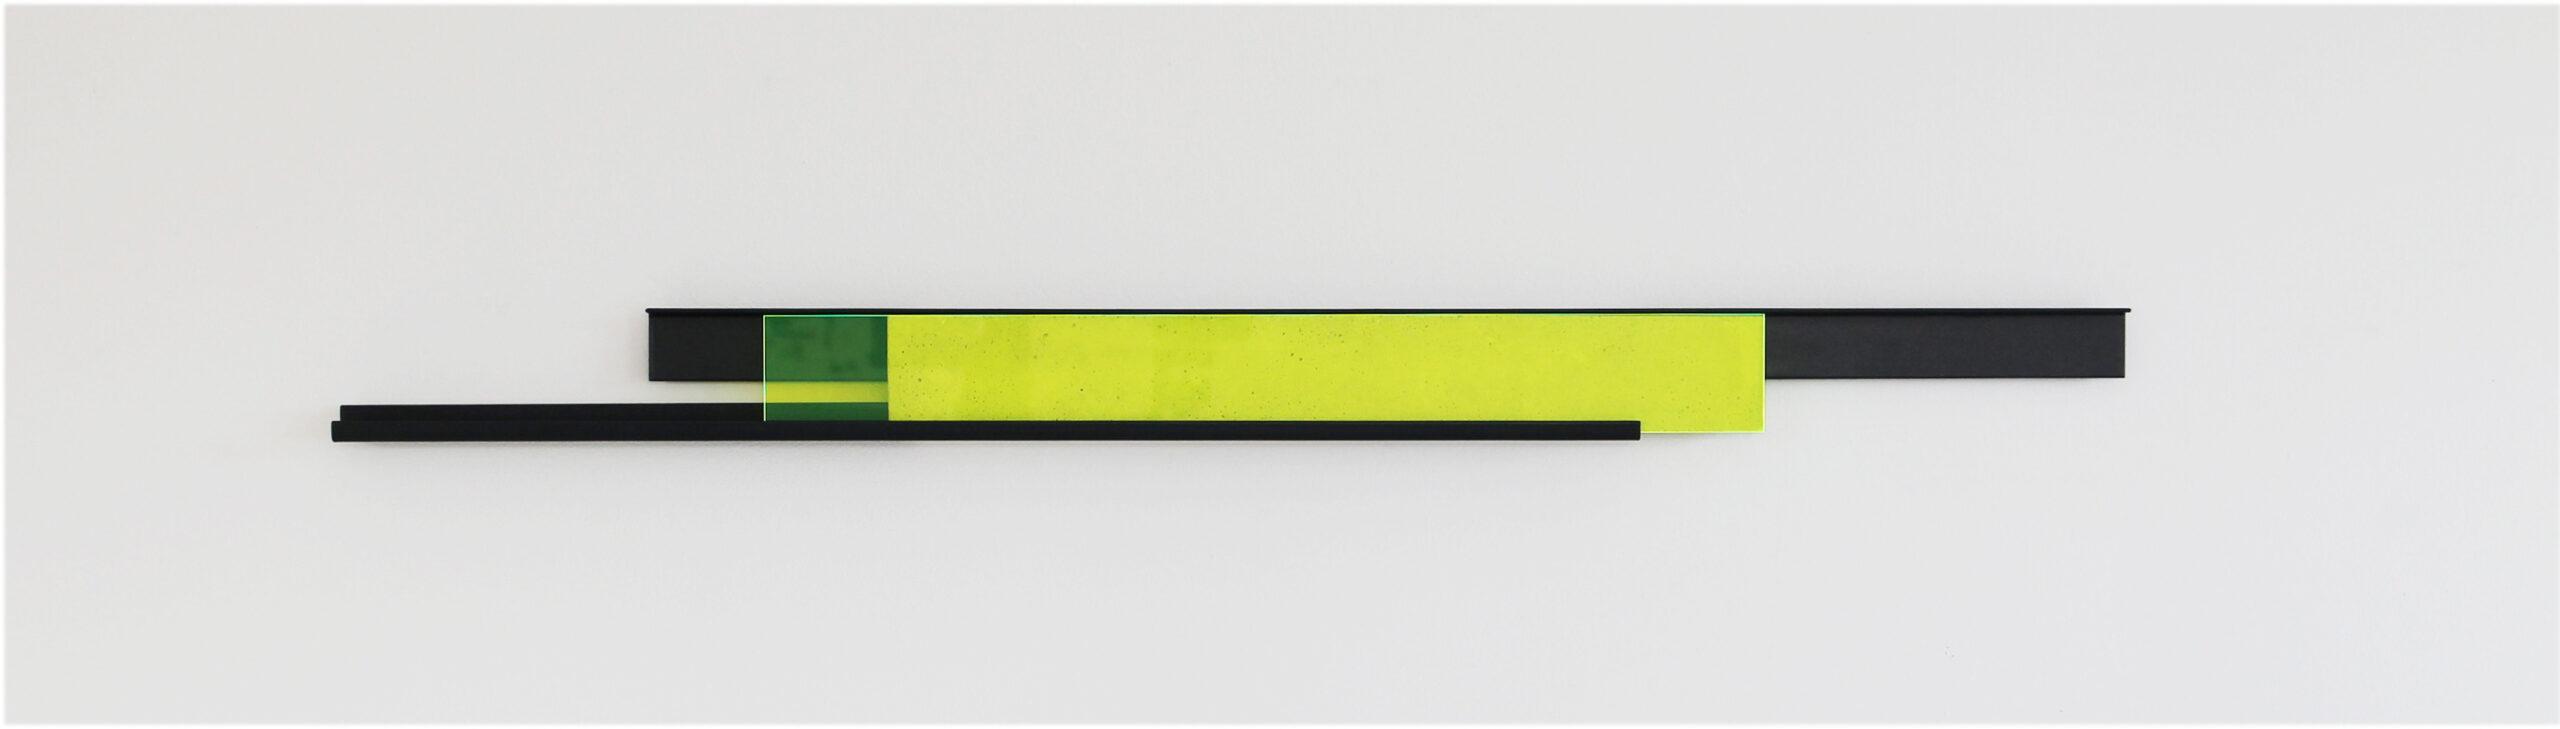 Addition X | 2017 | Beton | 96 x 7 x 5 cm